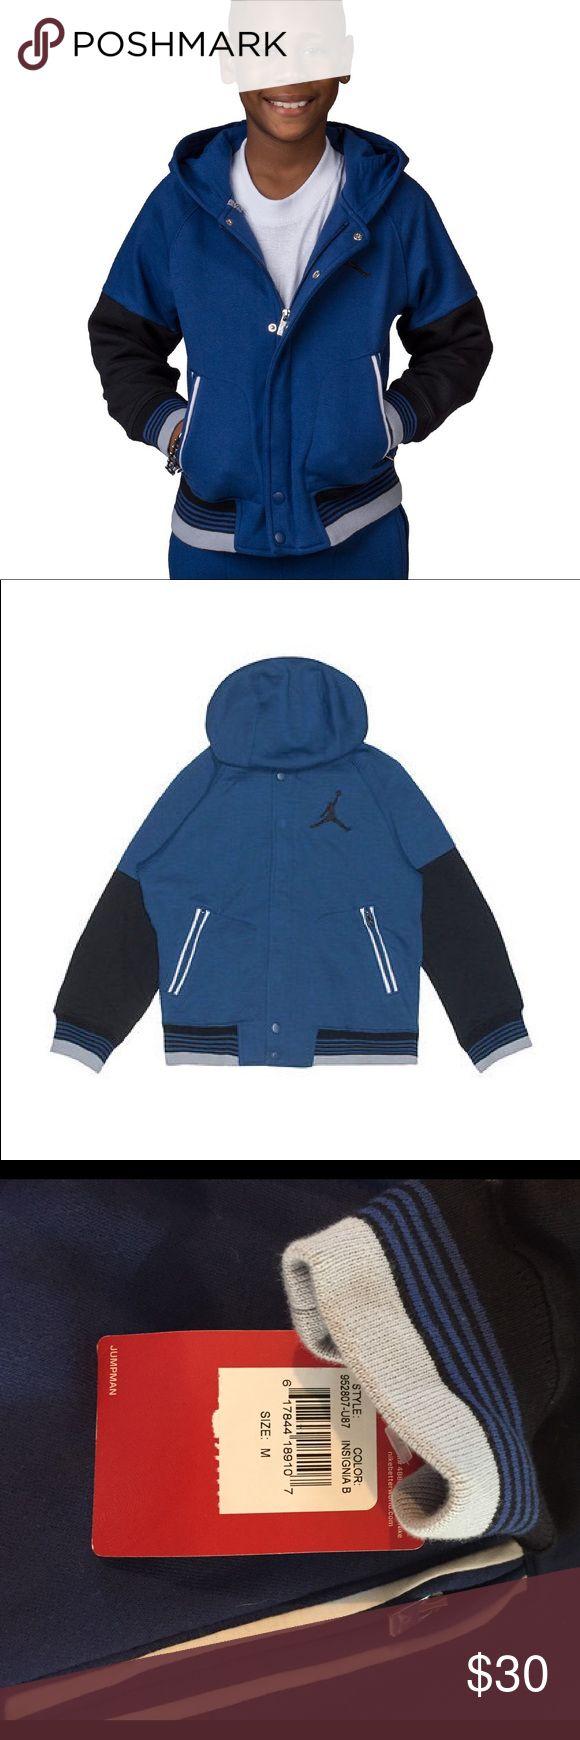 Nike Boys jumpman23 varsity Jacket Insignia blue with black and grey Nike Jackets & Coats